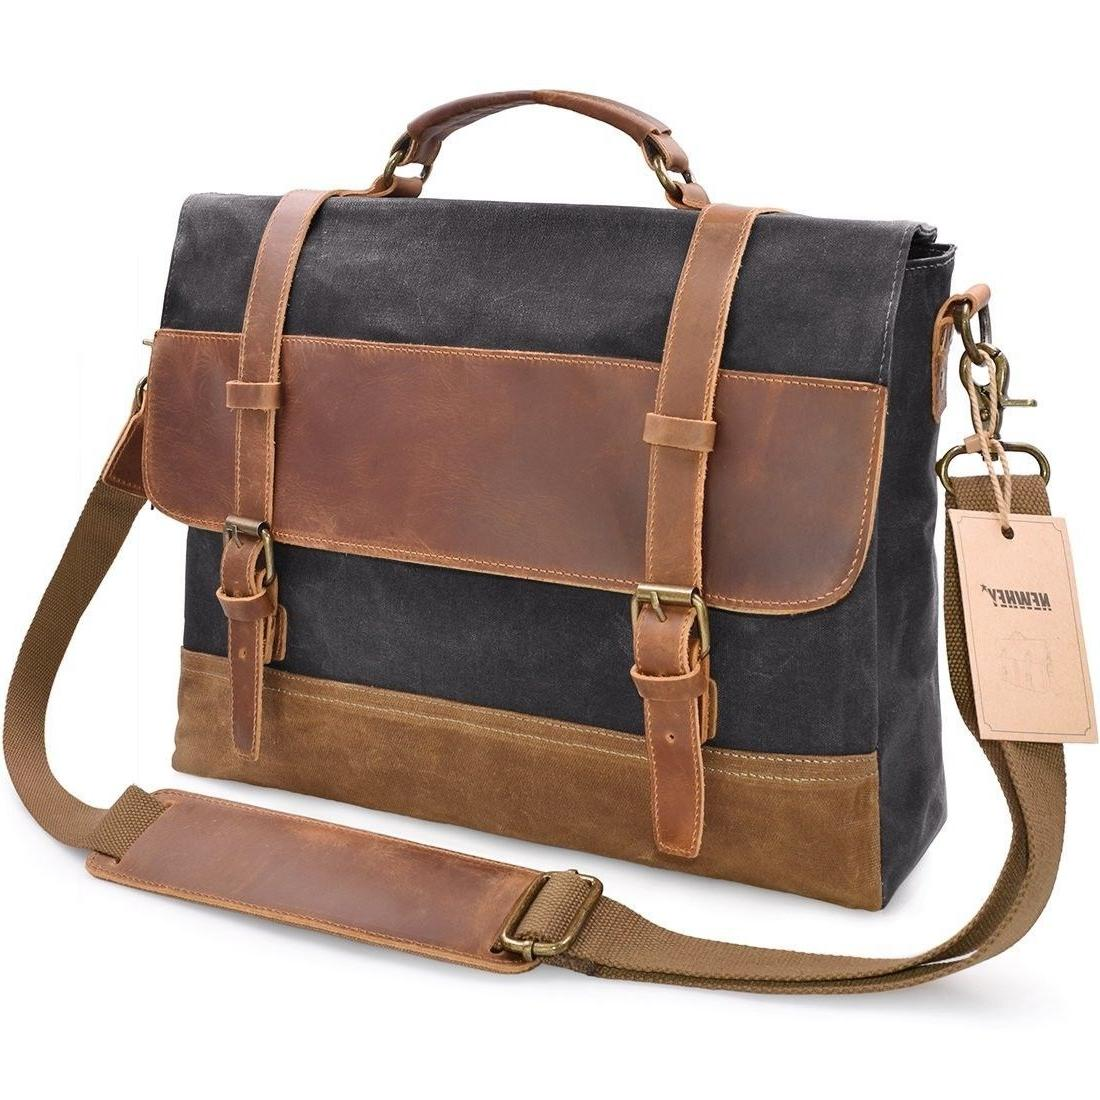 NEWHEY Mens Messenger Bag Waterproof Canvas Leather Computer d257f94a23b6d